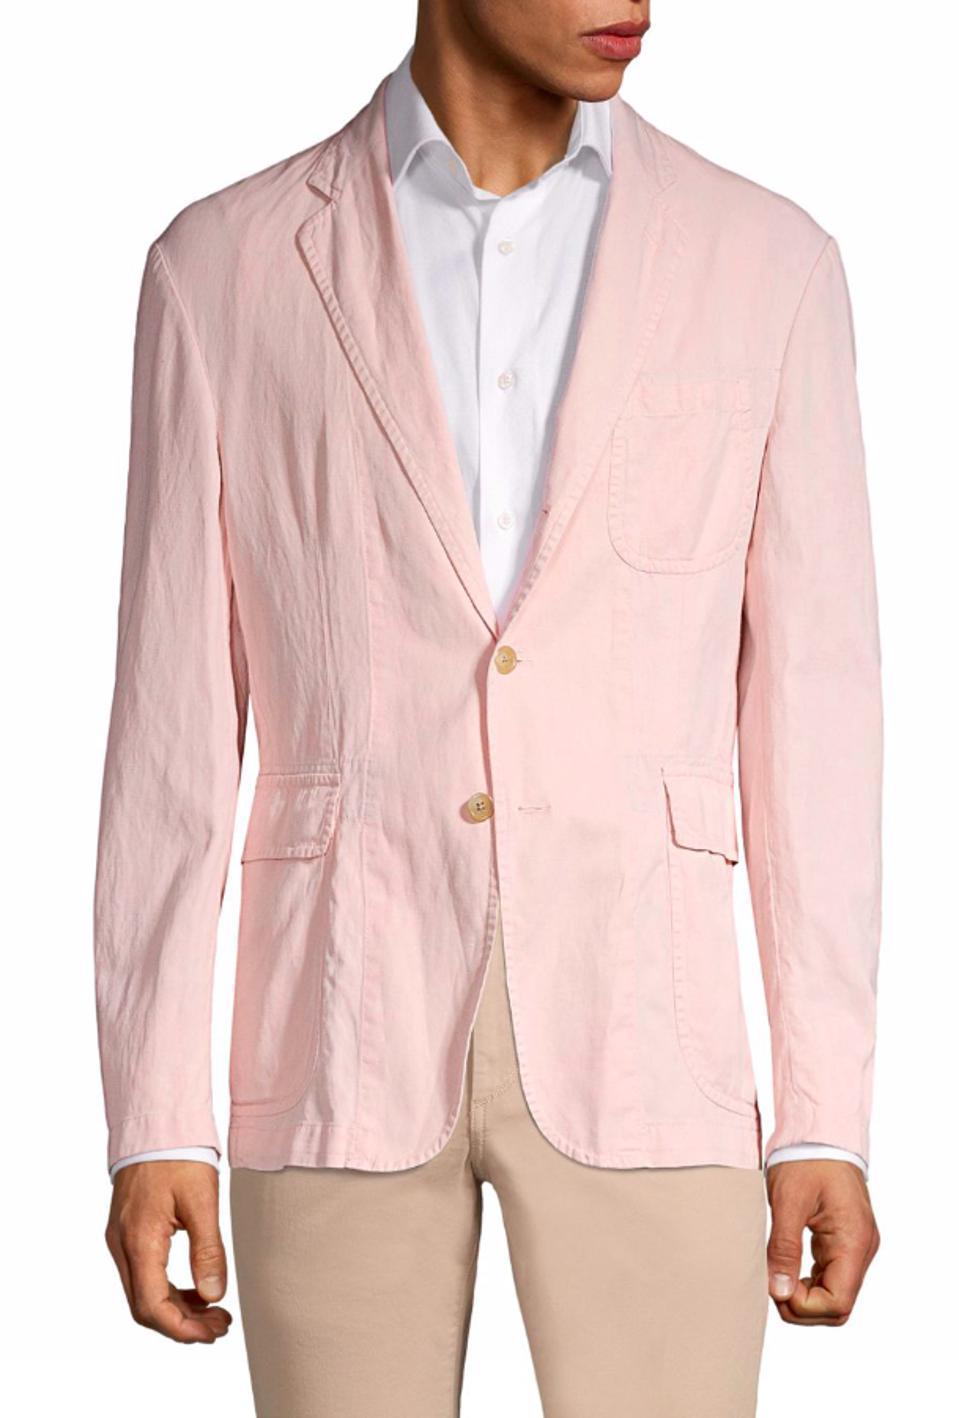 Polo Ralph Lauren Linen Blend Sportcoat